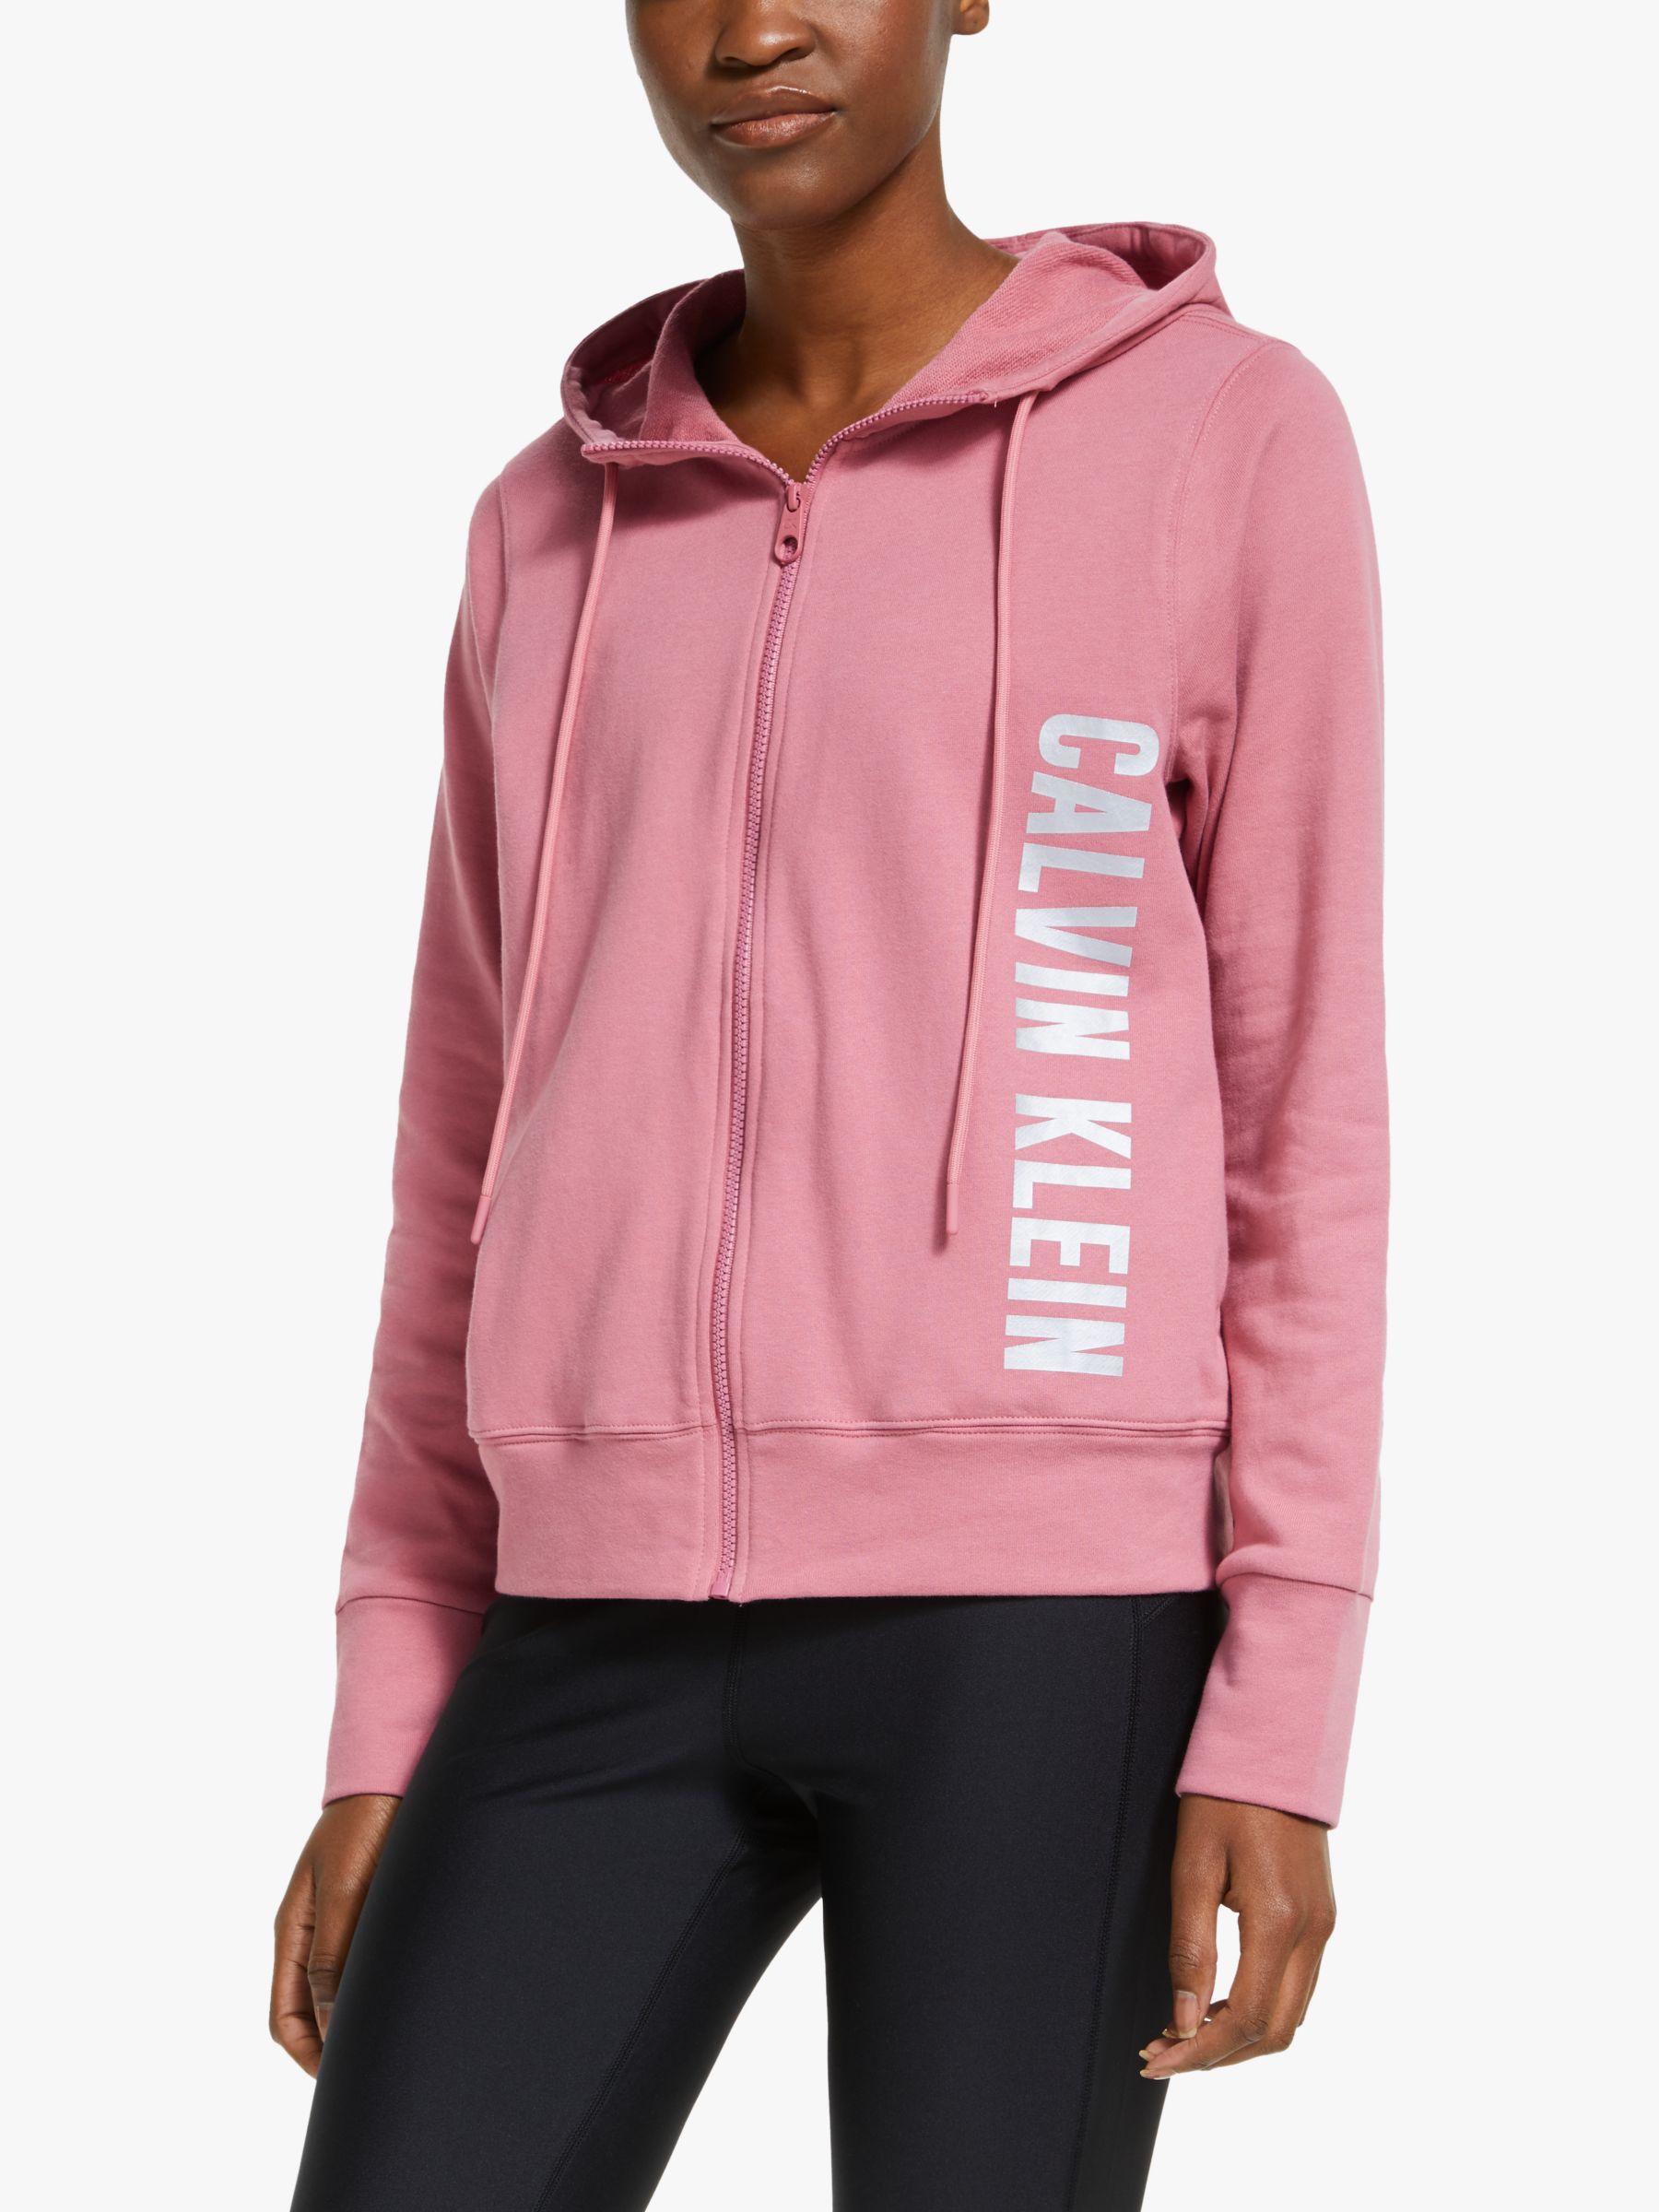 Calvin Klein Calvin Klein Performance Plain Zip Hoodie Jacket